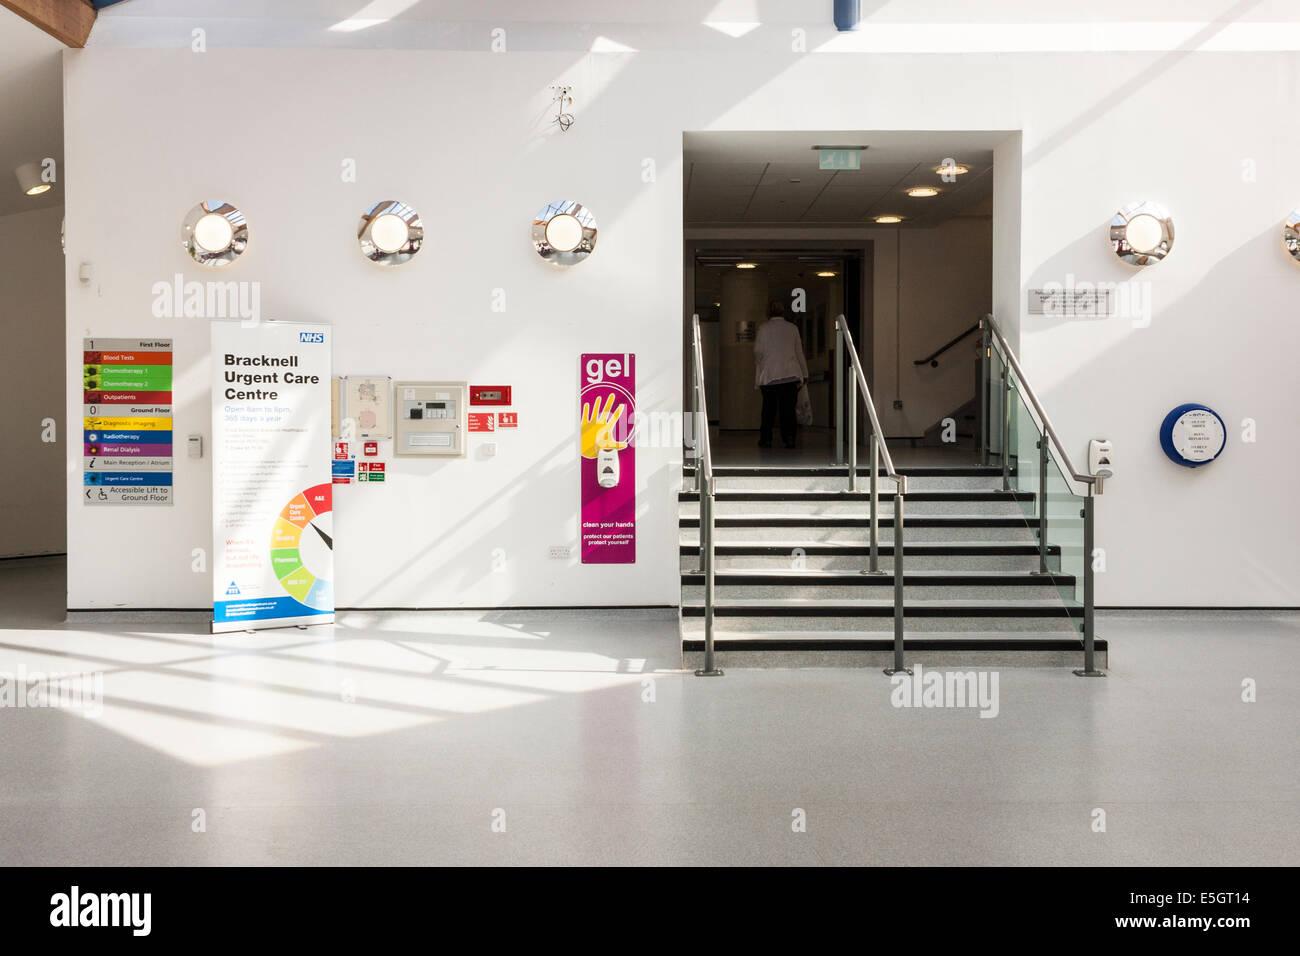 Entrance to NHS Urgent Care Centre, Bracknell, Berkshire, England, GB, UK. - Stock Image